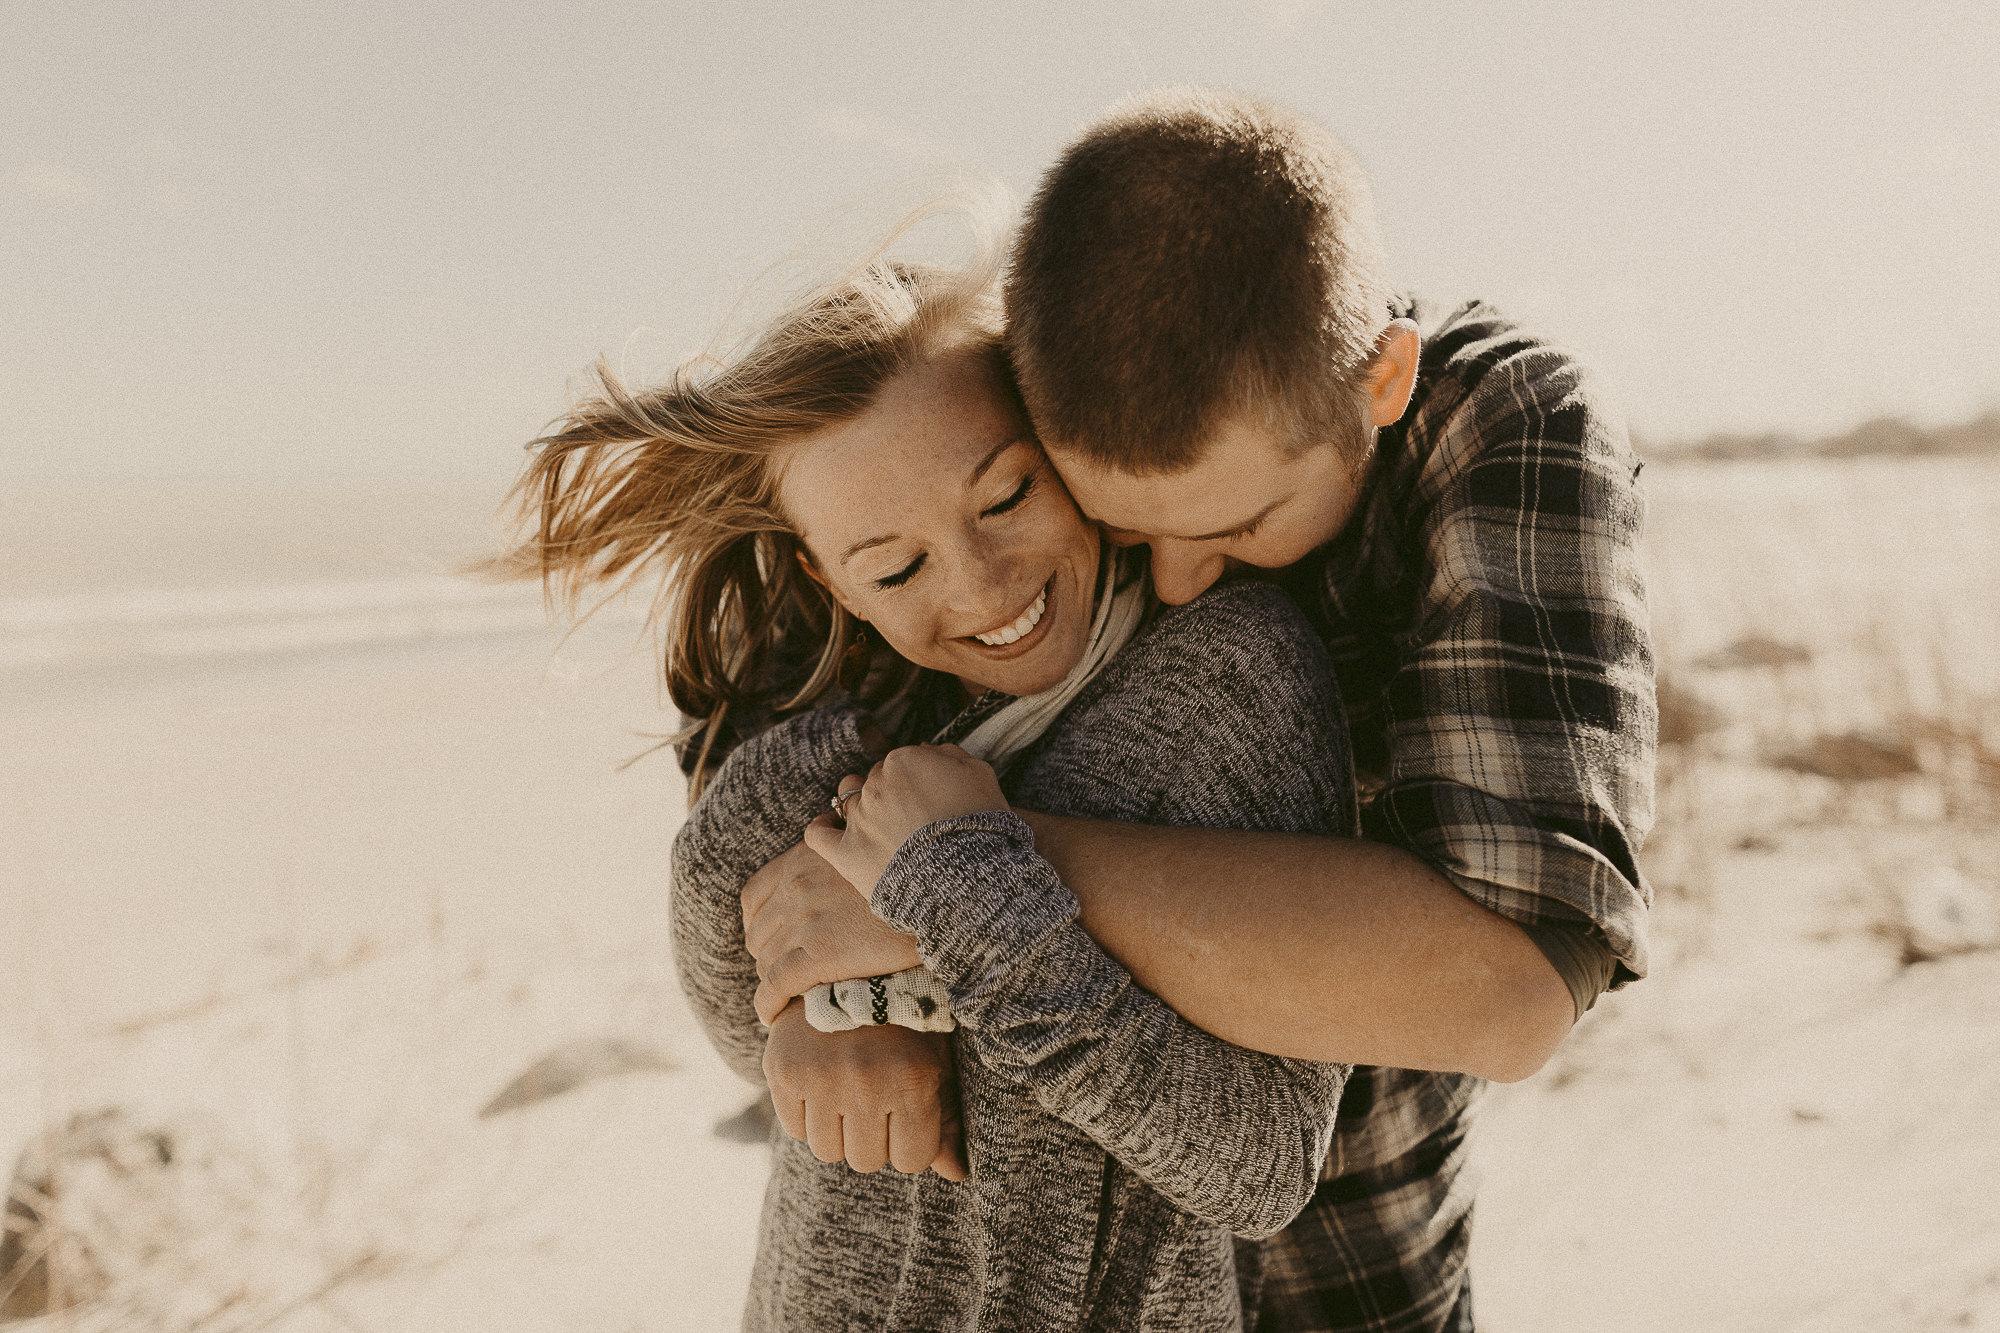 entry-13-brooke_kittell_purelybrookephotography_hugs (1).jpg